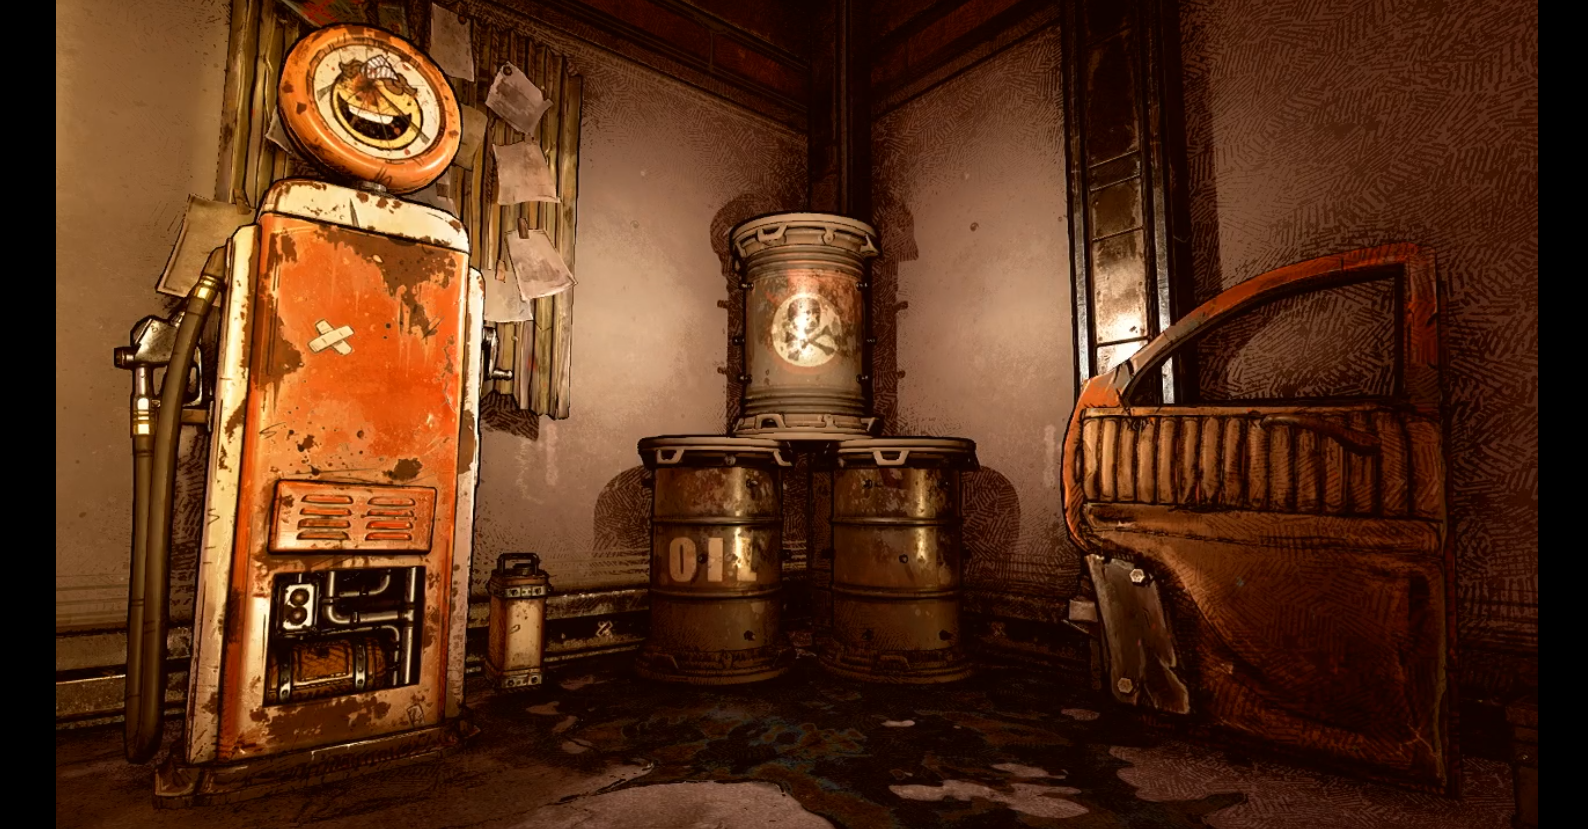 Borderlands 3 tech demo Twitch stream screenshots from